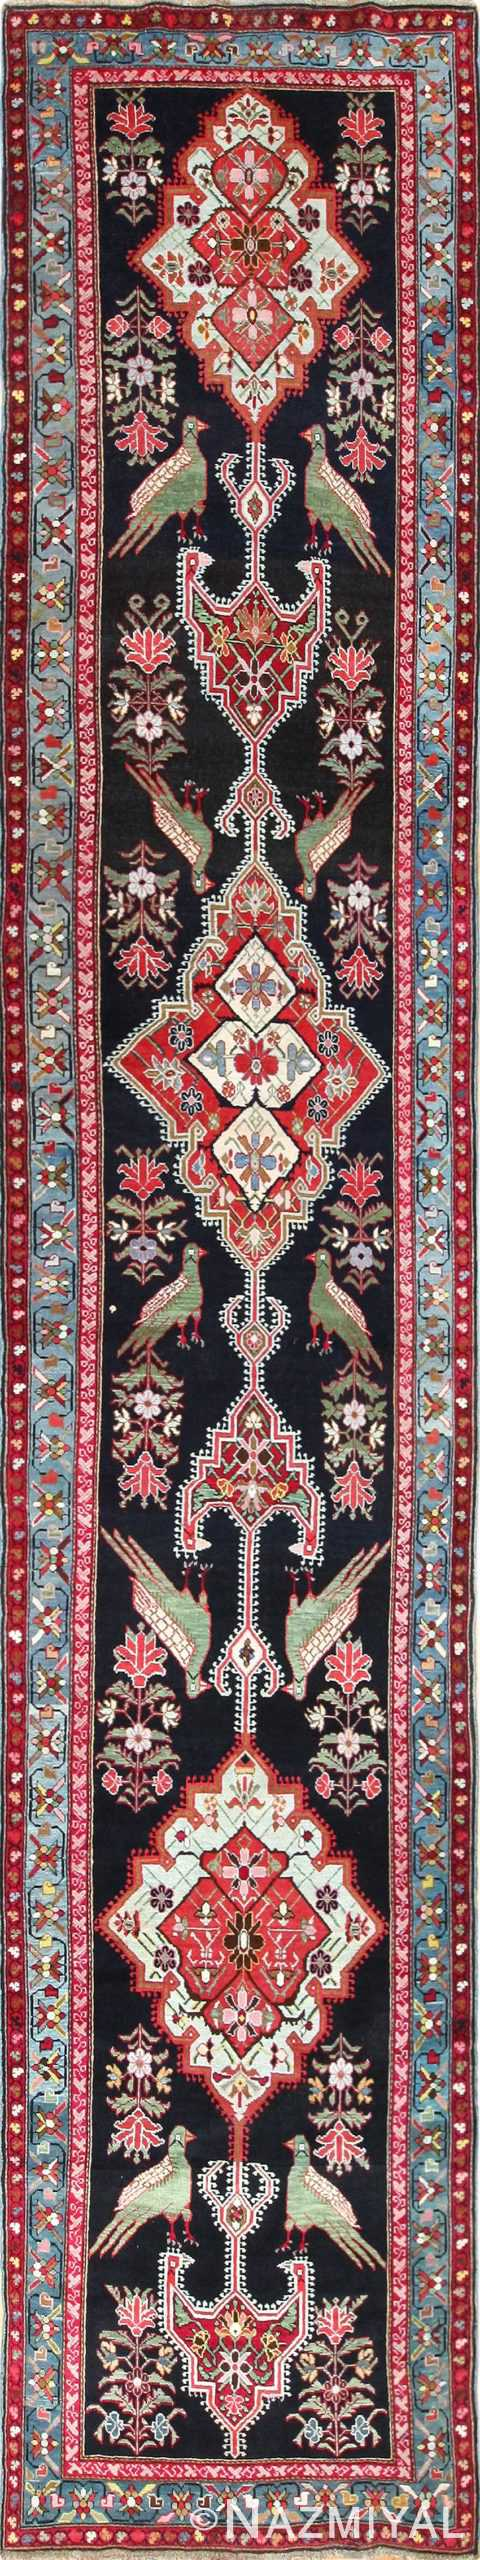 antique black background karabagh caucasian rug 49390 Nazmiyal